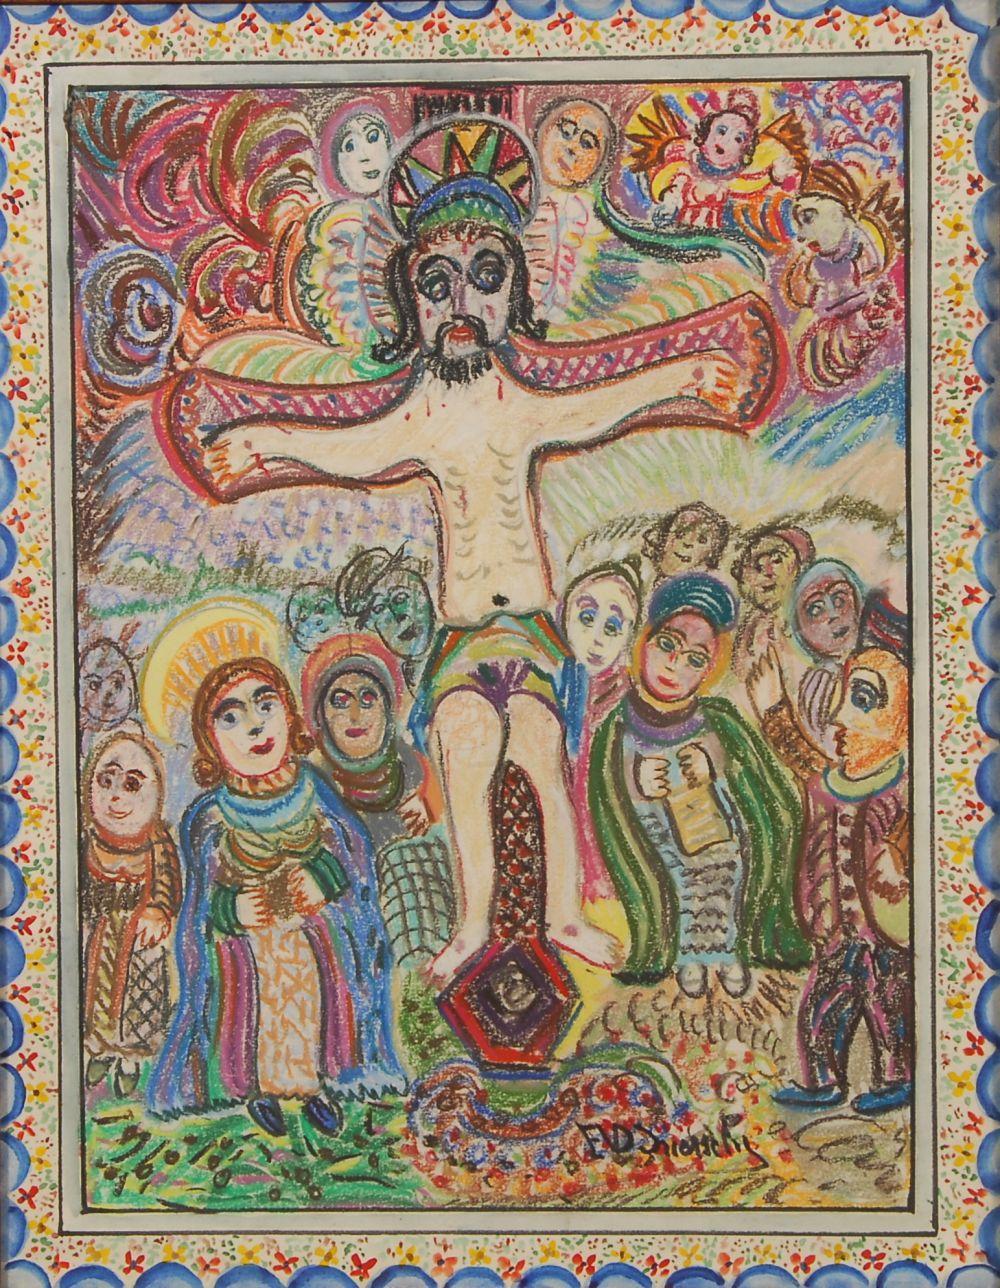 Ernest Van den Driessche (1894-1985) La crucifixion